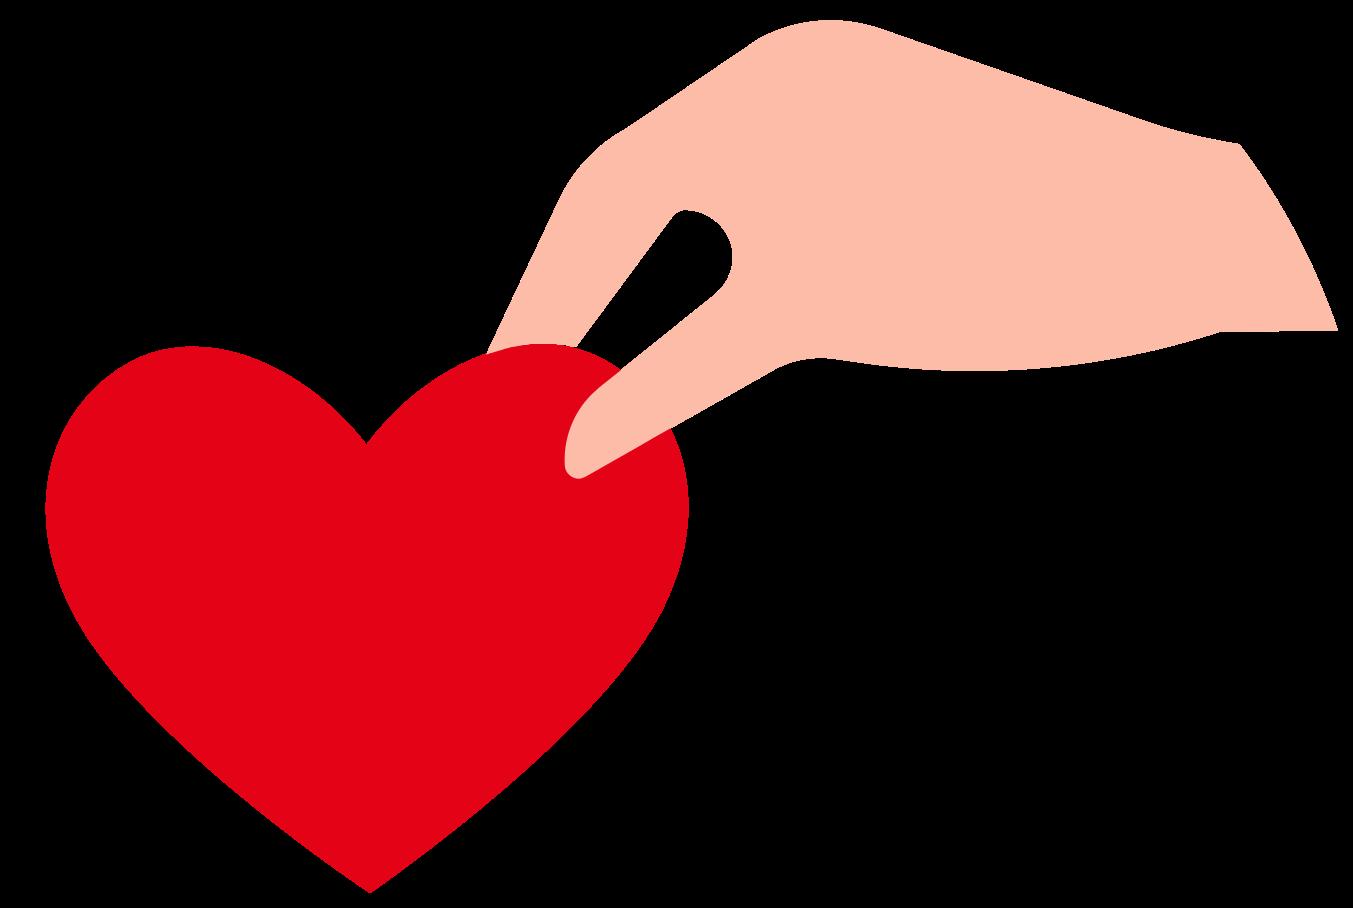 hart helpende hand png